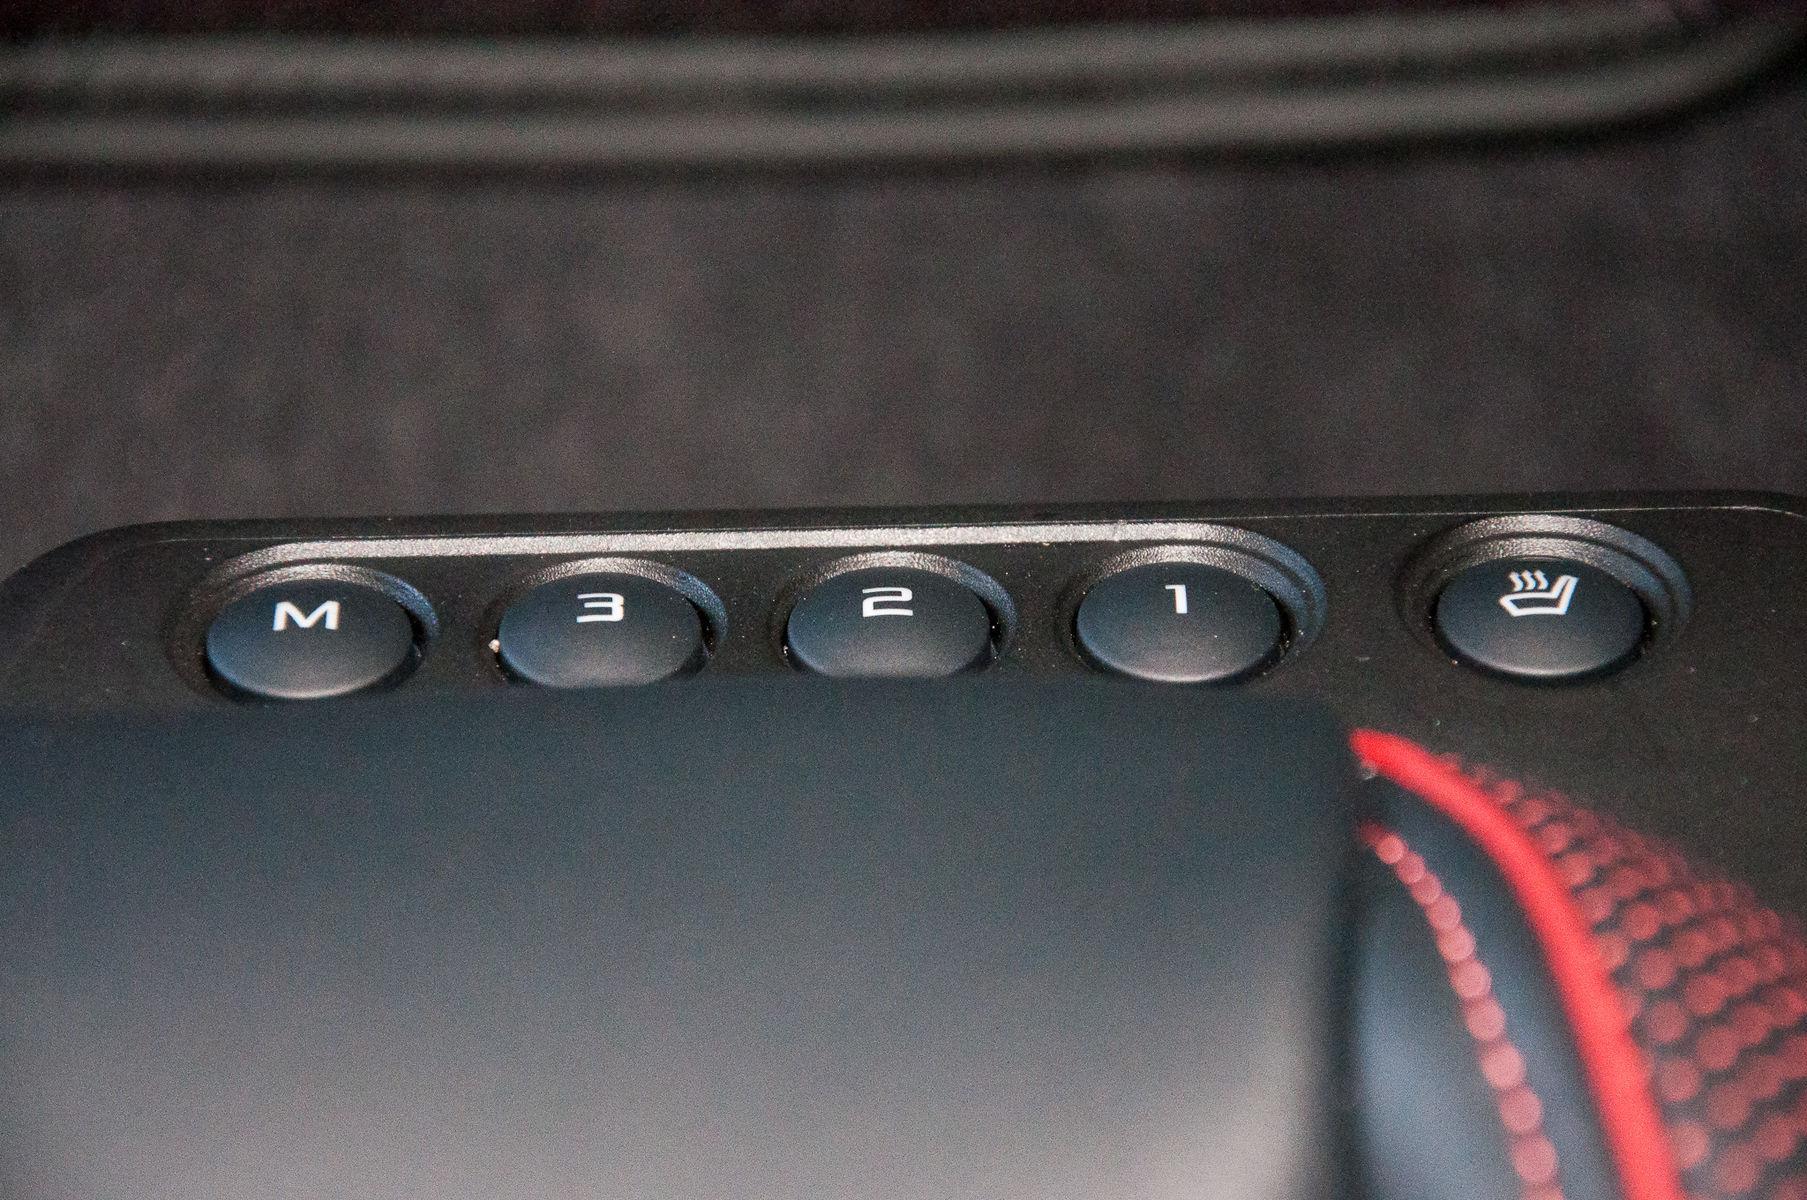 2014 McLaren MP4-12C Spider | 12C Spider 3010